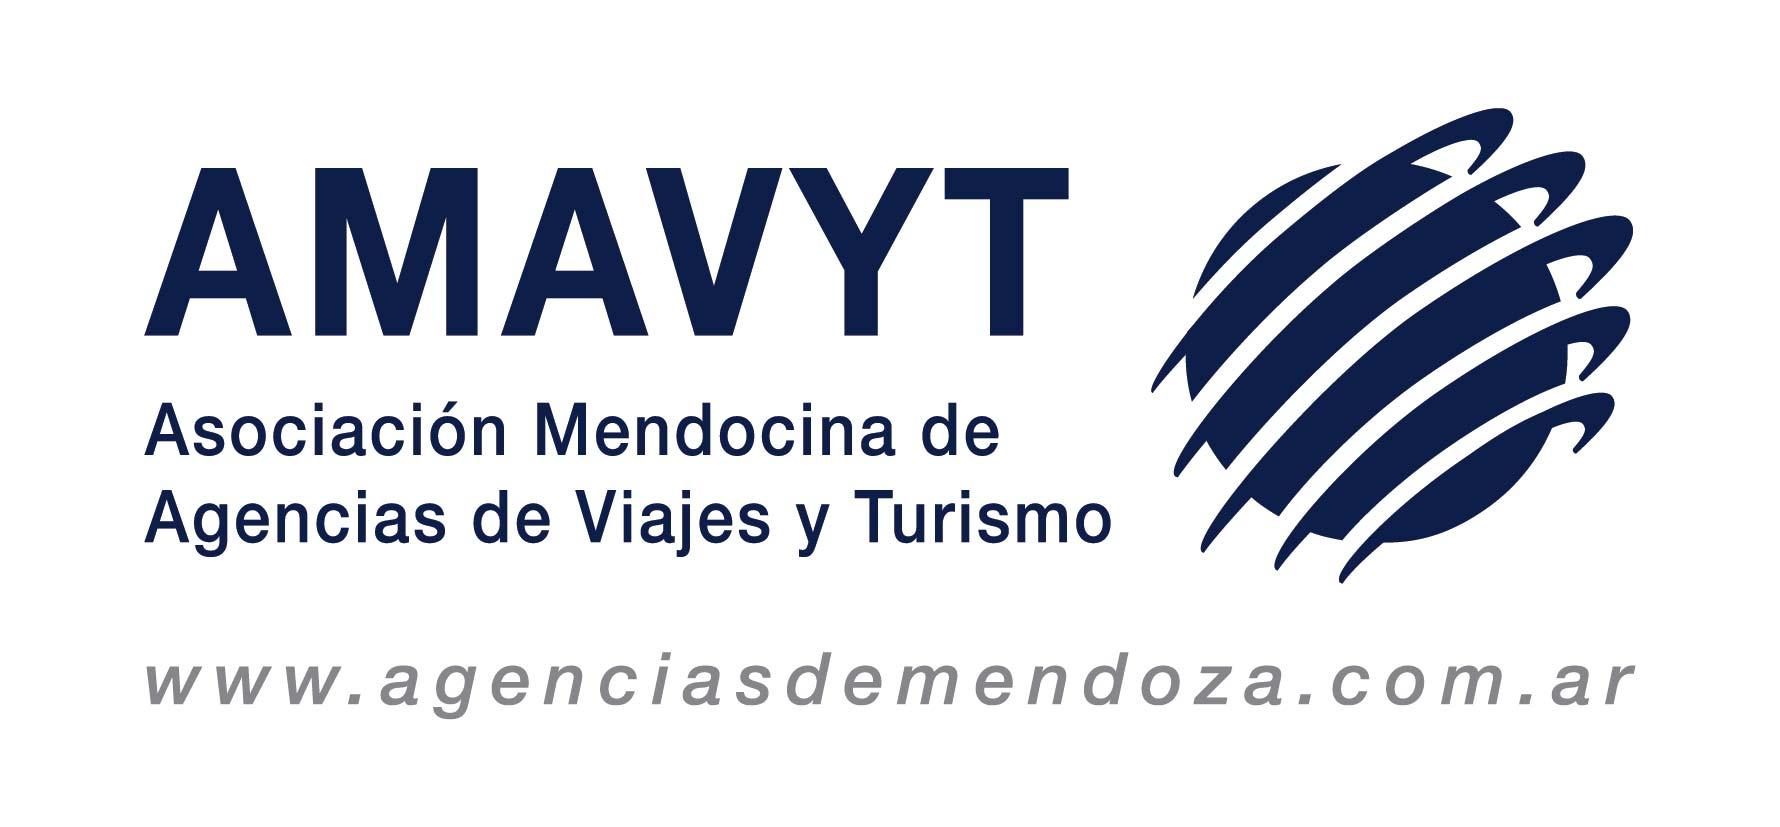 MarcaAMAVYT2015